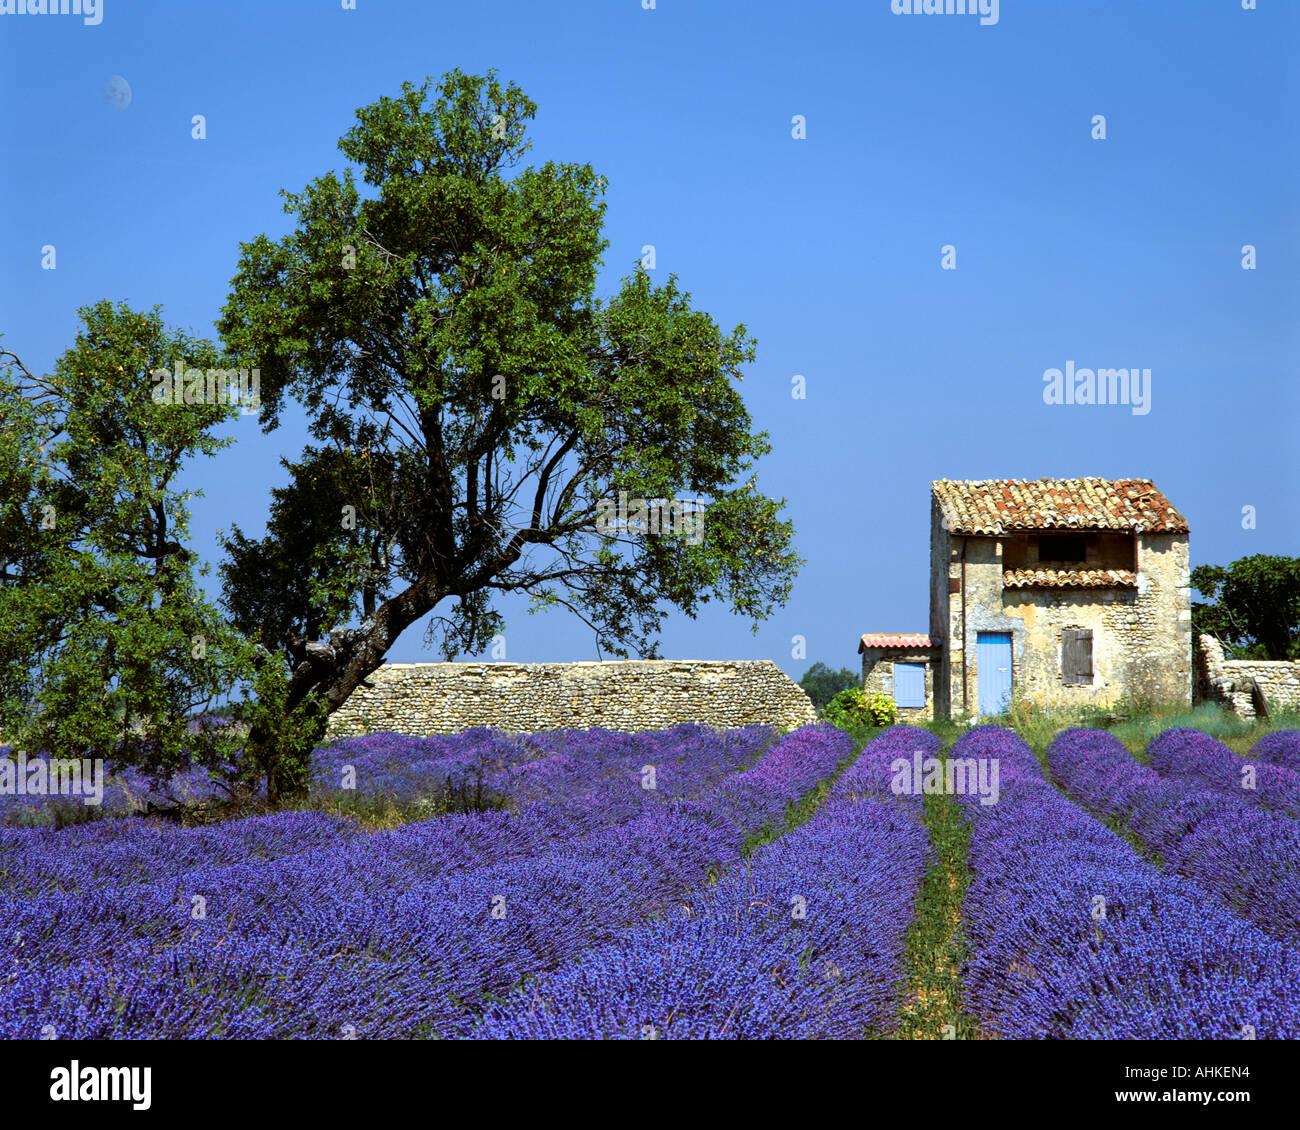 FR - Alpes-de-HAUTE-Provence: Campo de lavanda en la meseta de Valensole cerca Puimoisson Imagen De Stock